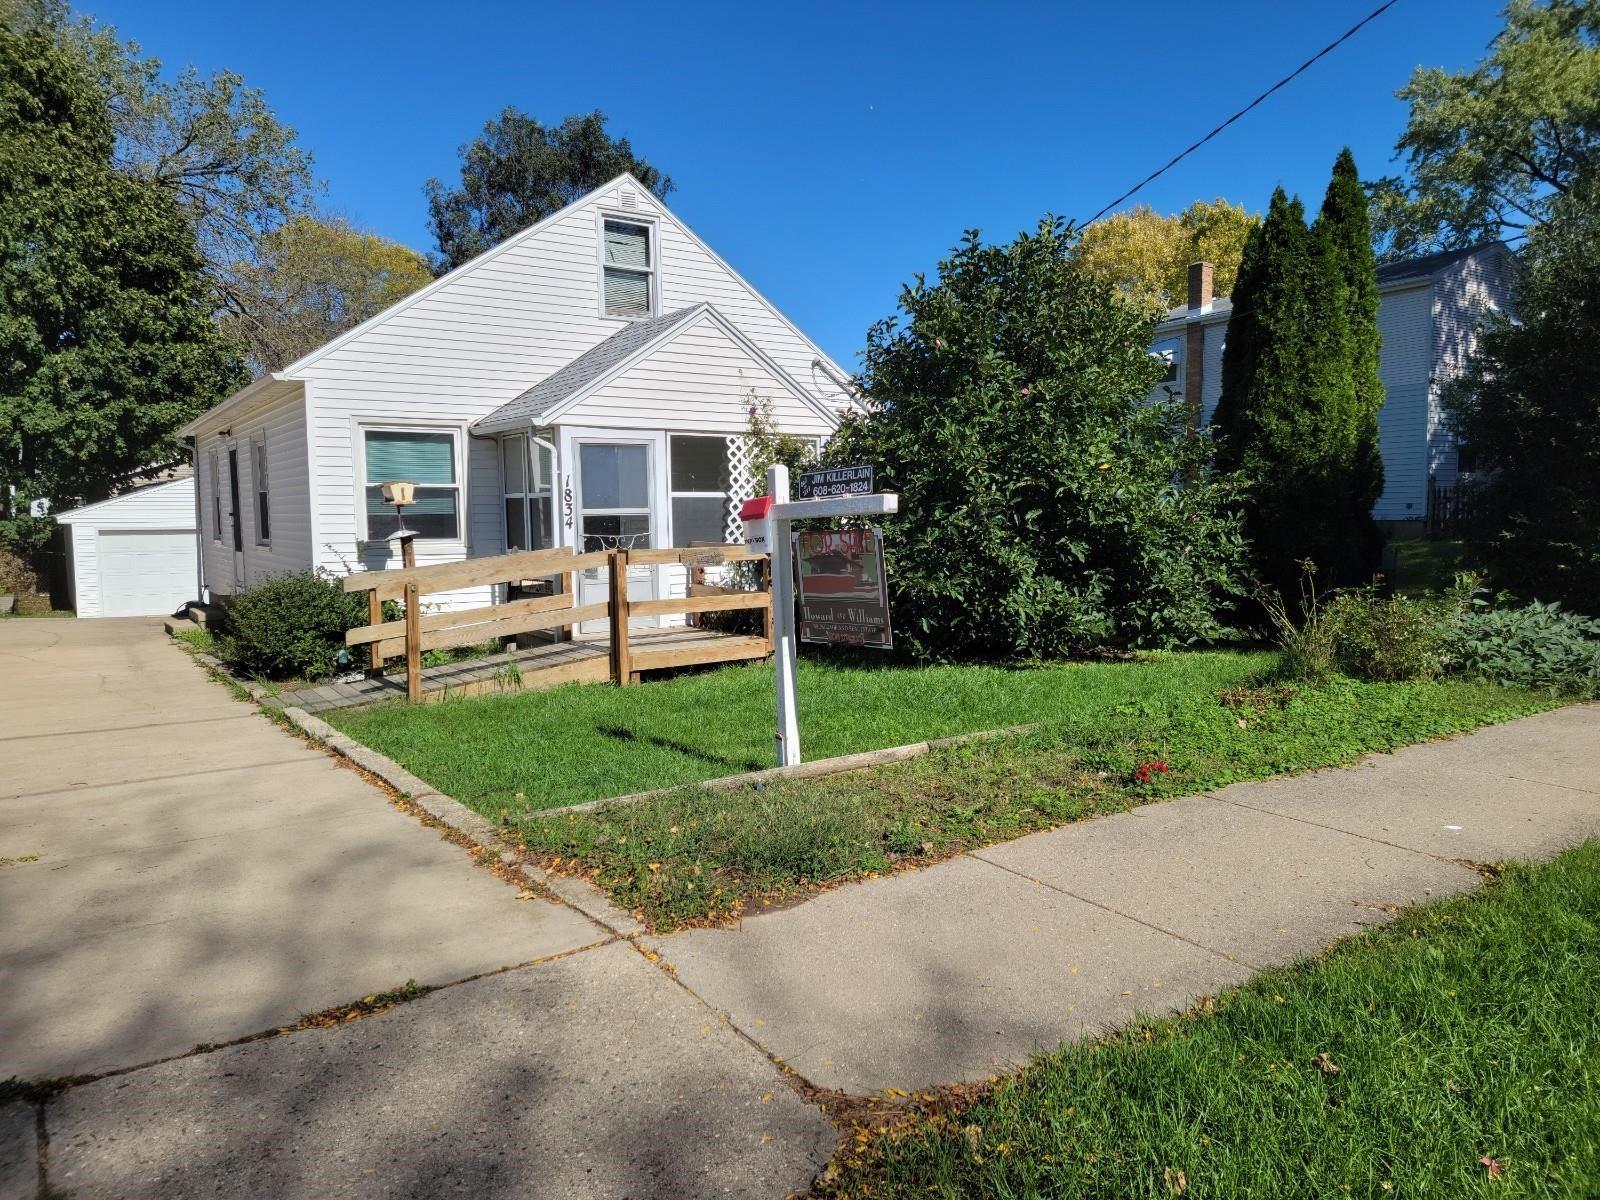 Photo for 1834 Northwestern Ave, Madison, WI 53704-3418 (MLS # 1921797)